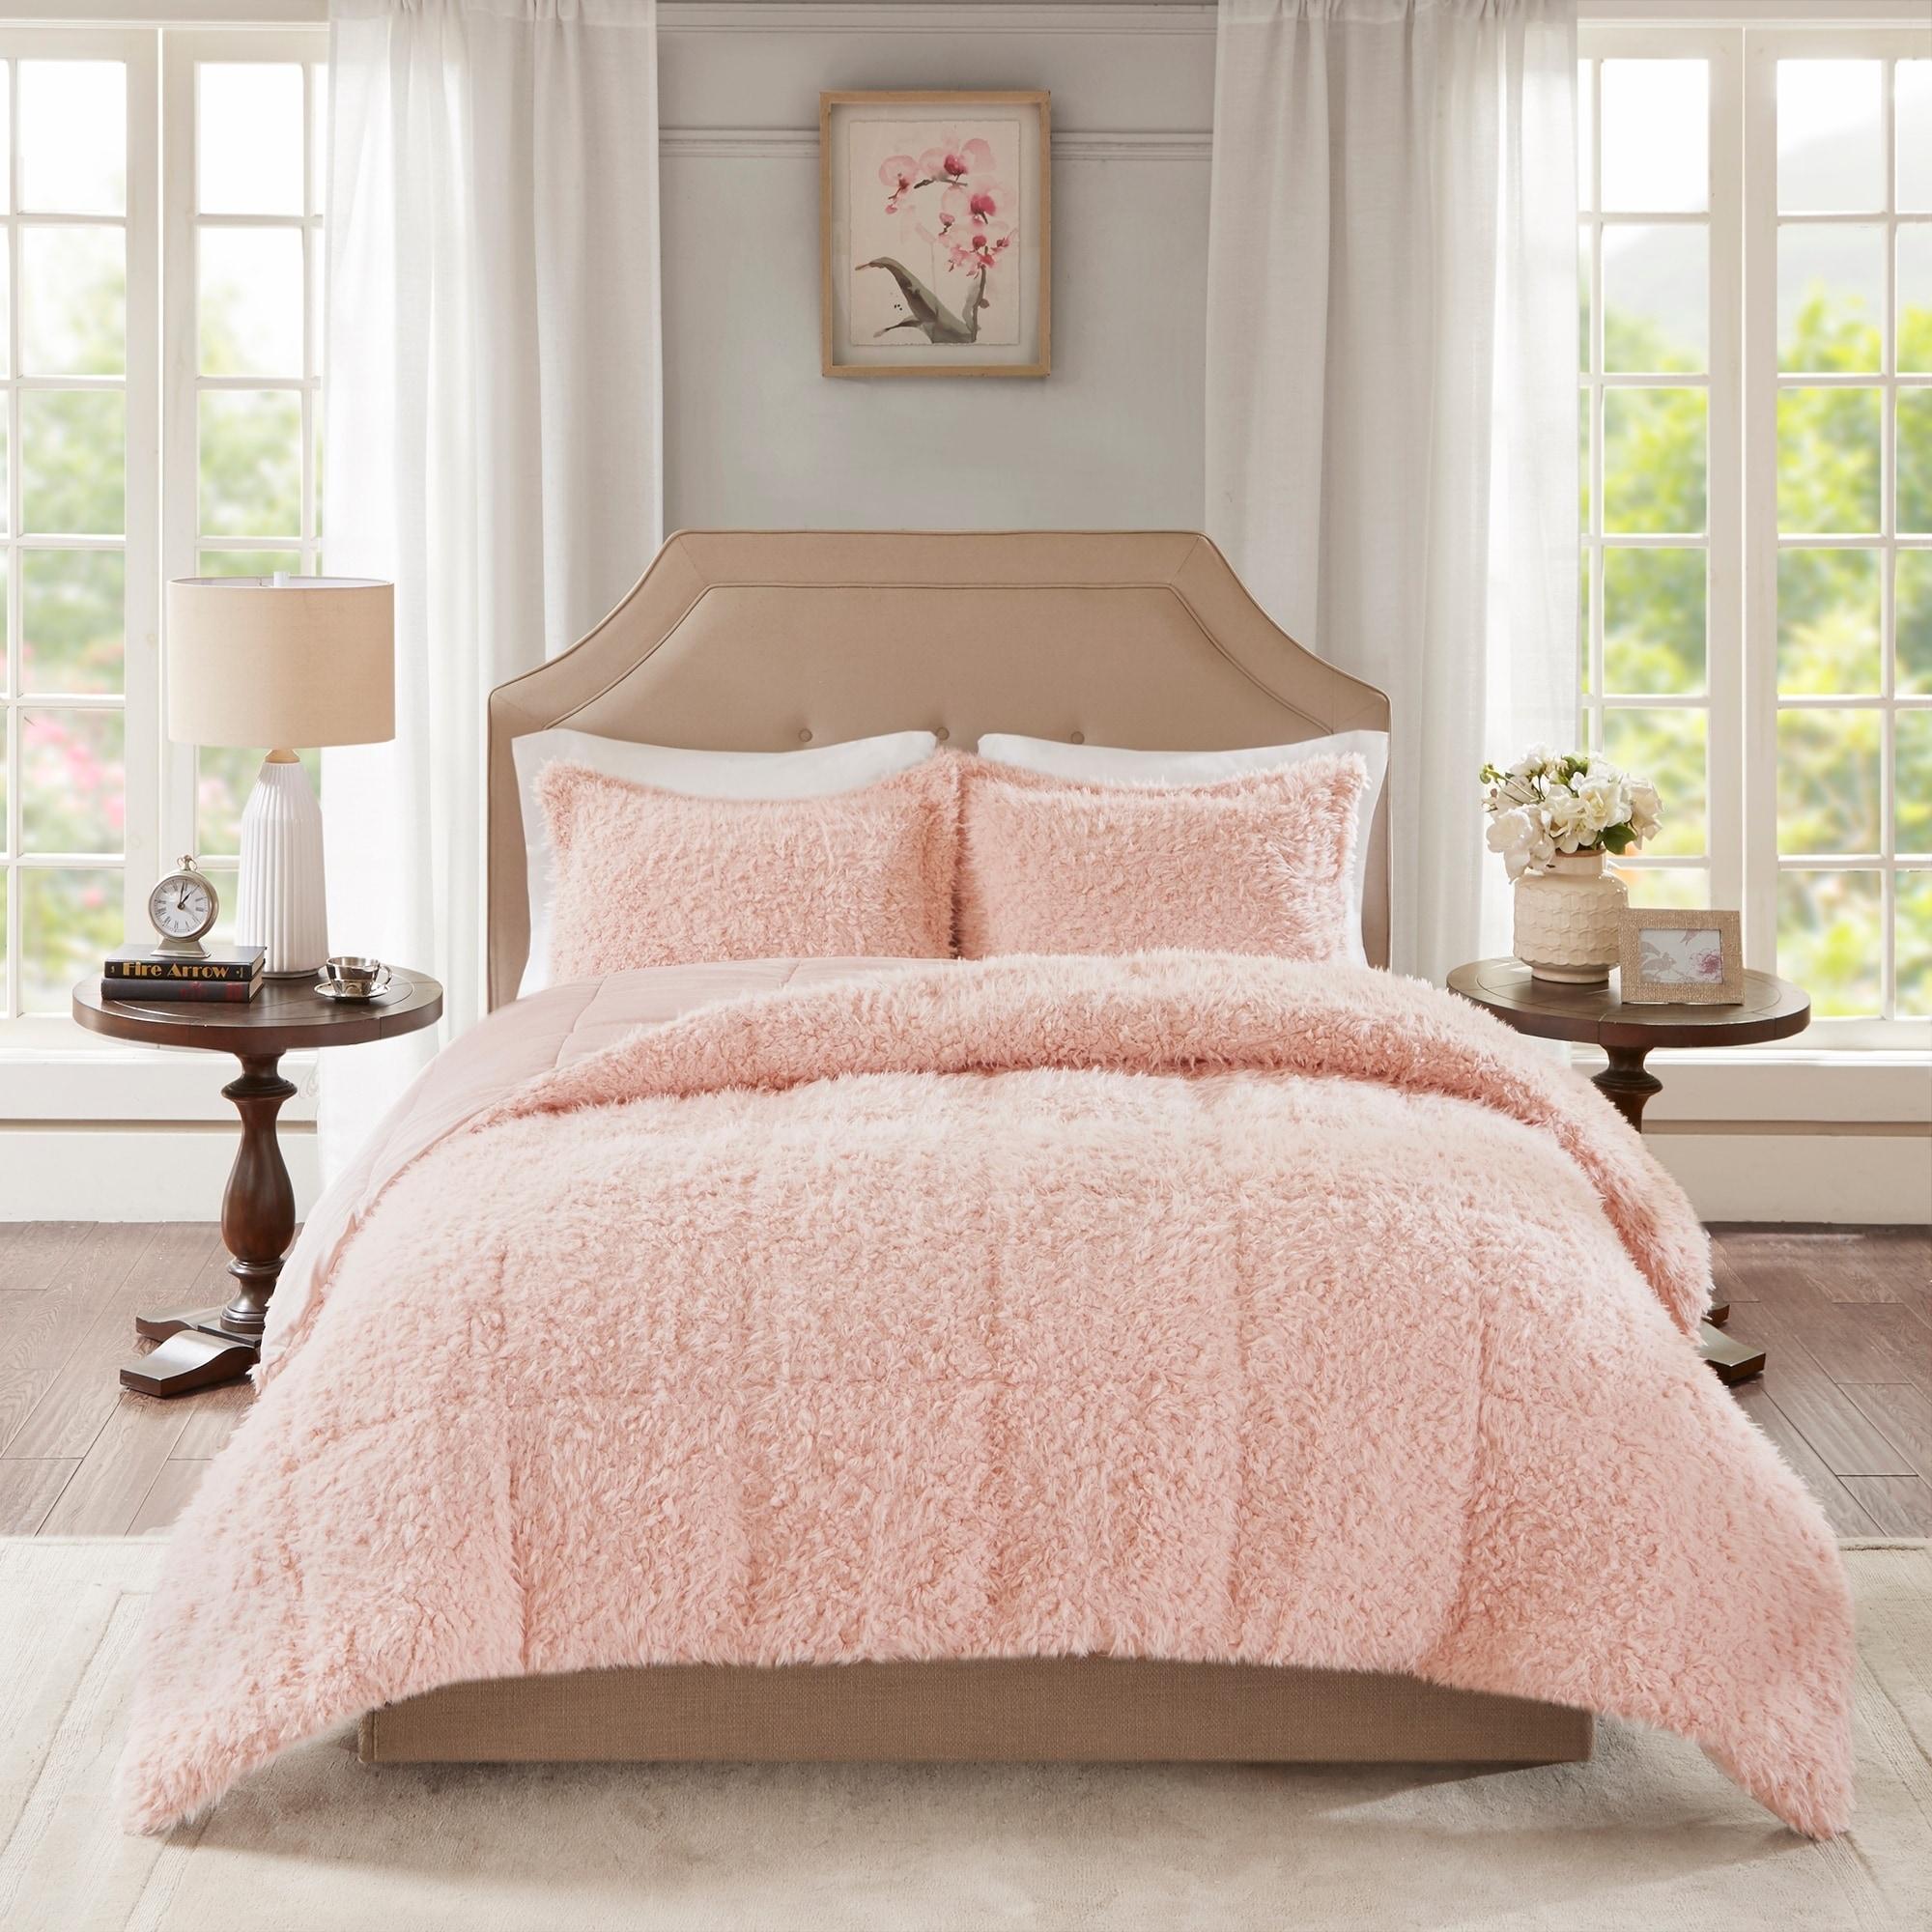 Madison Park Zoe 100 Percent Polyester Solid Faux Fur Comforter Set 2 Color Option